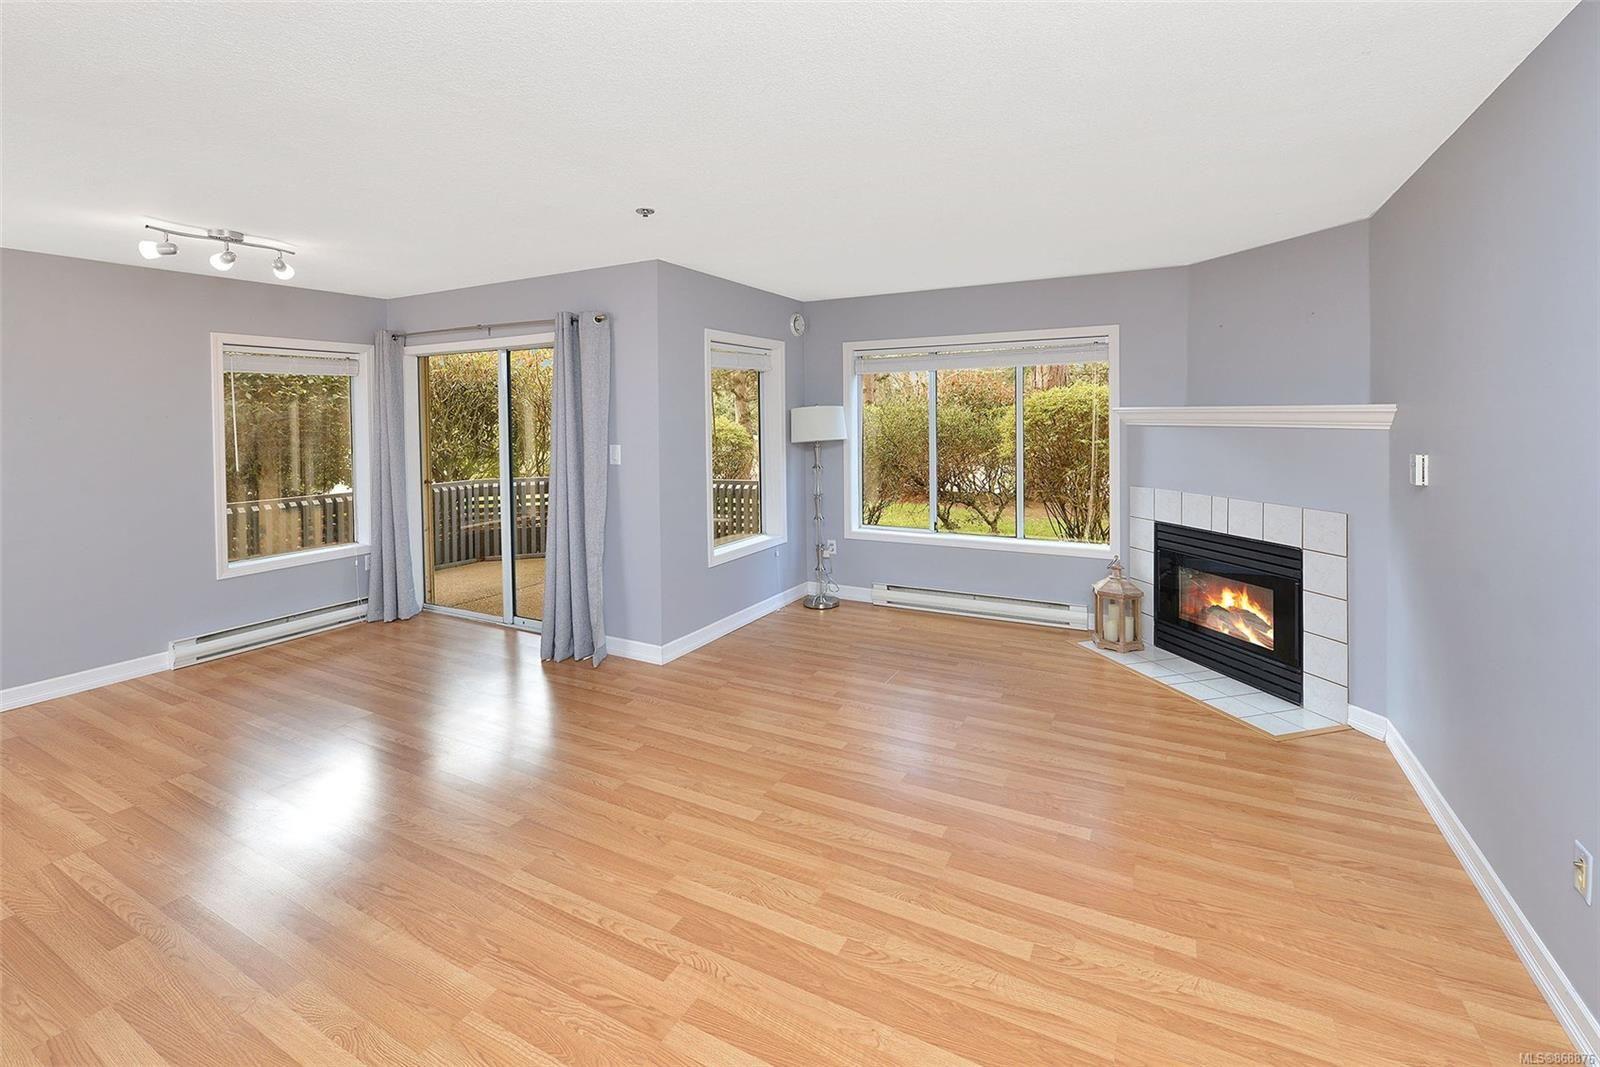 Main Photo: 101 2900 Orillia St in : SW Gorge Condo for sale (Saanich West)  : MLS®# 868876